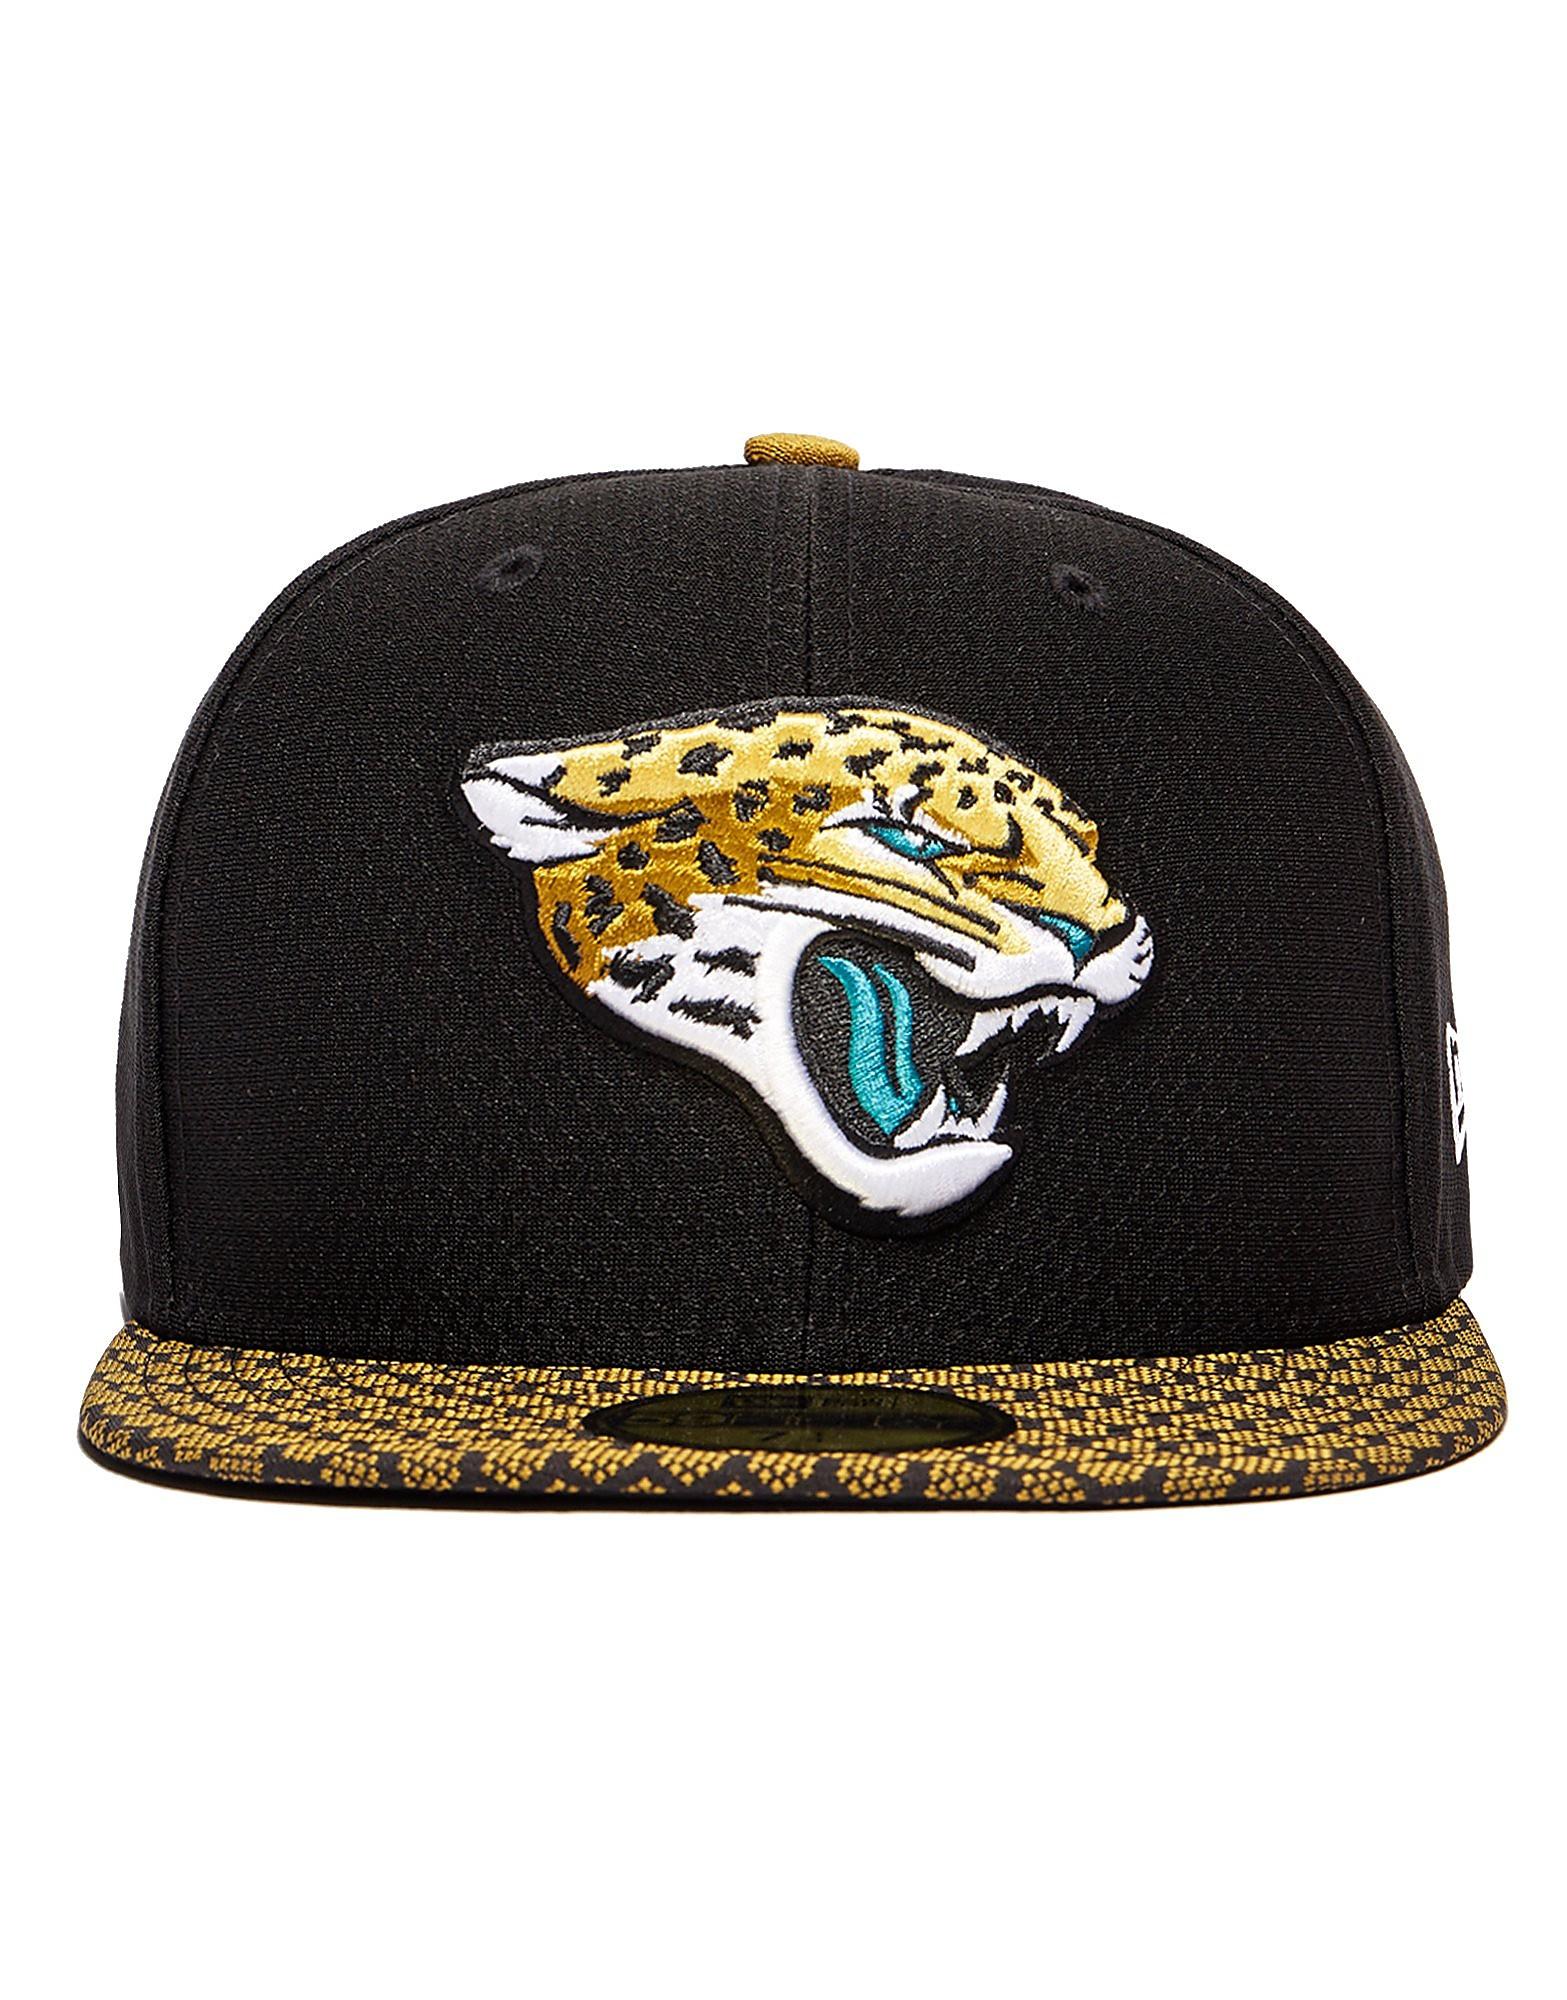 New Era Jackson Jaguar 59FIFTY Cappellino